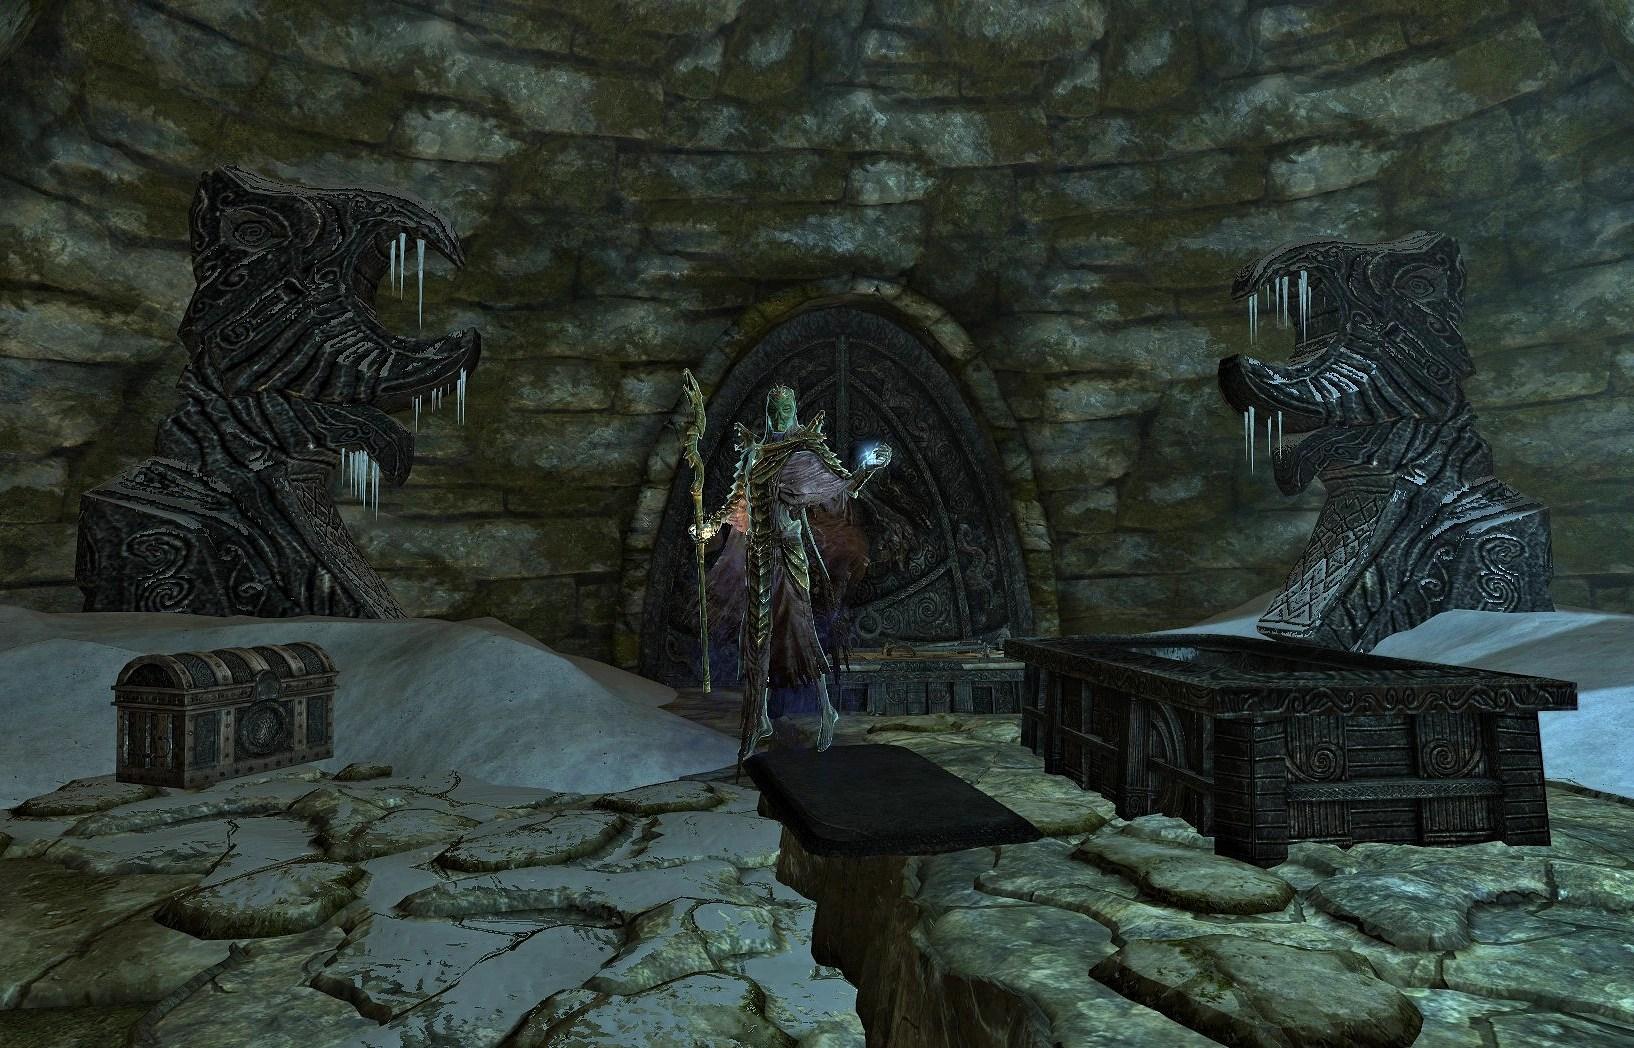 Lotr Fall Wallpaper Siege On The Dragon Cult Elder Scrolls Fandom Powered